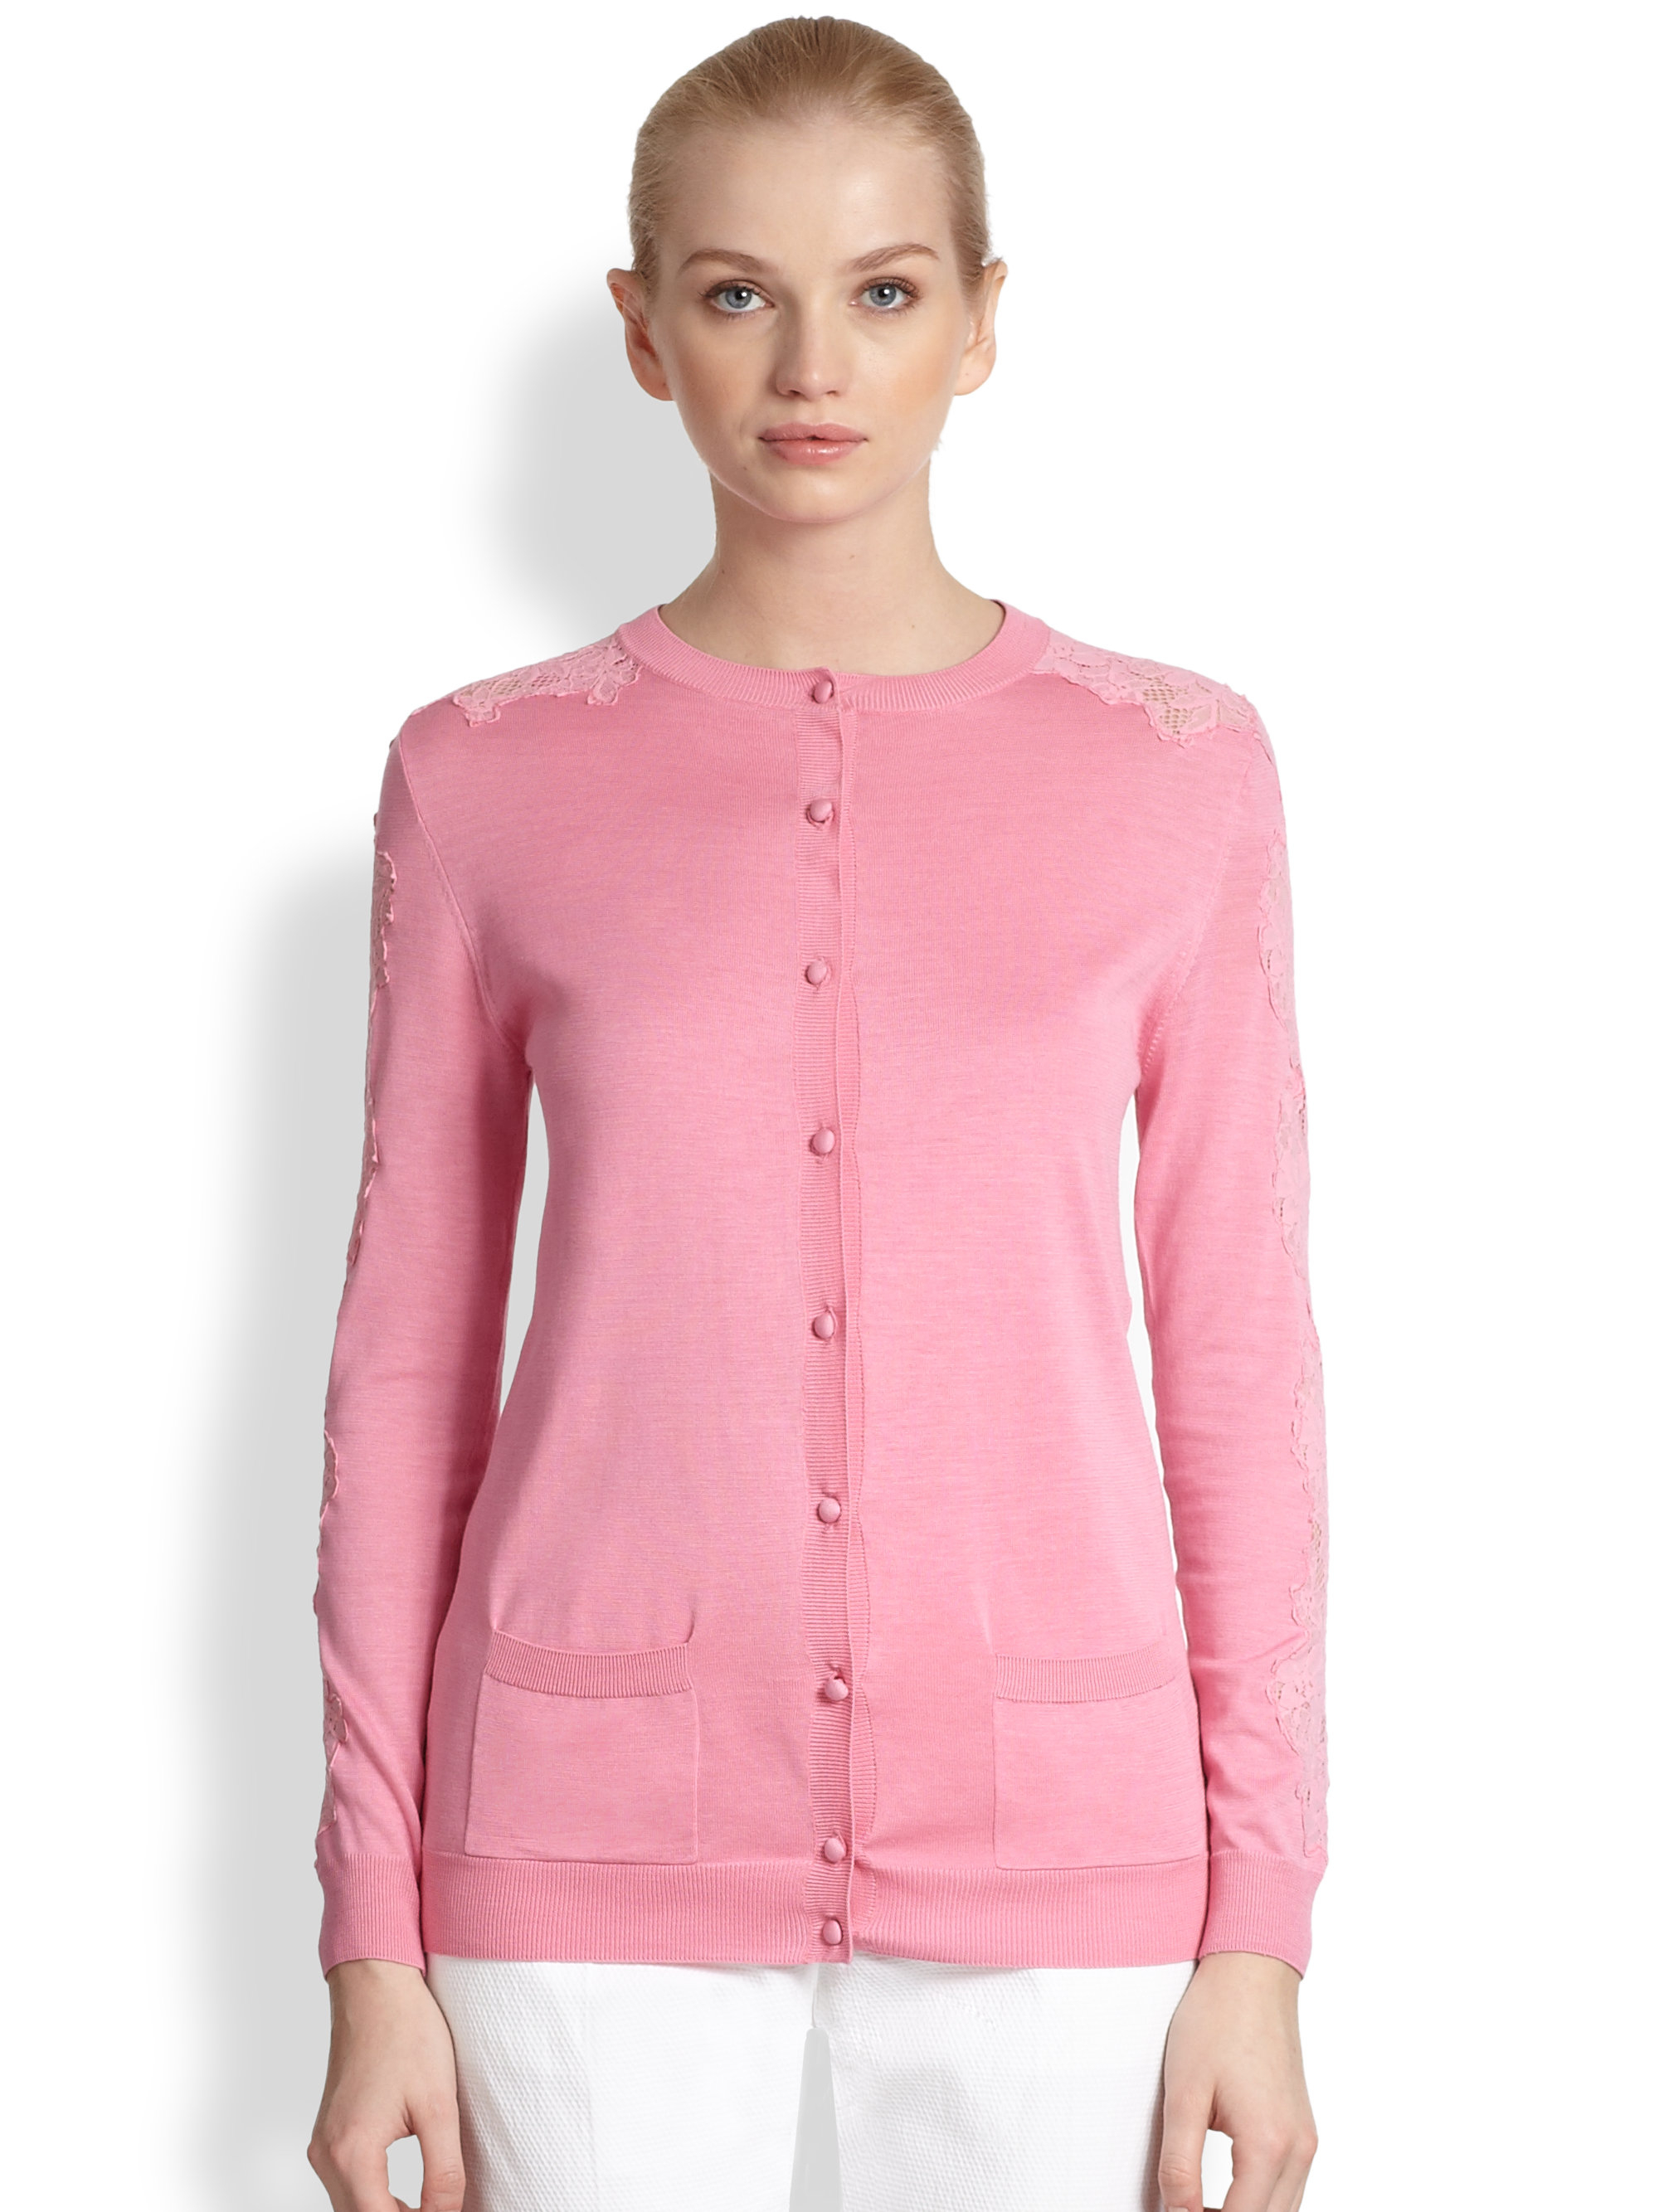 Nina ricci Silk Cotton Lace Insert Cardigan in Pink | Lyst